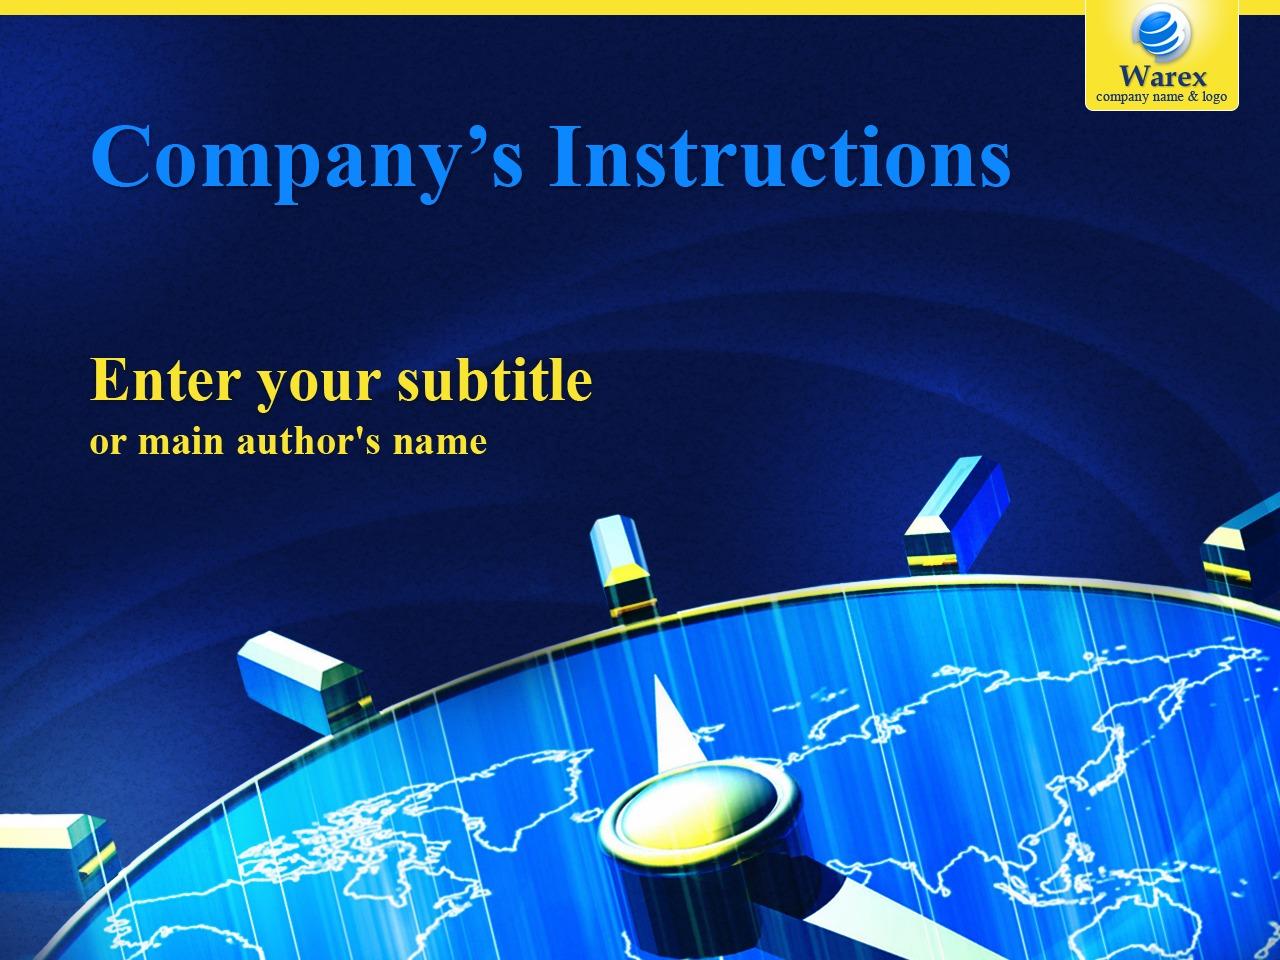 Business & Services PowerPoint Template - screenshot